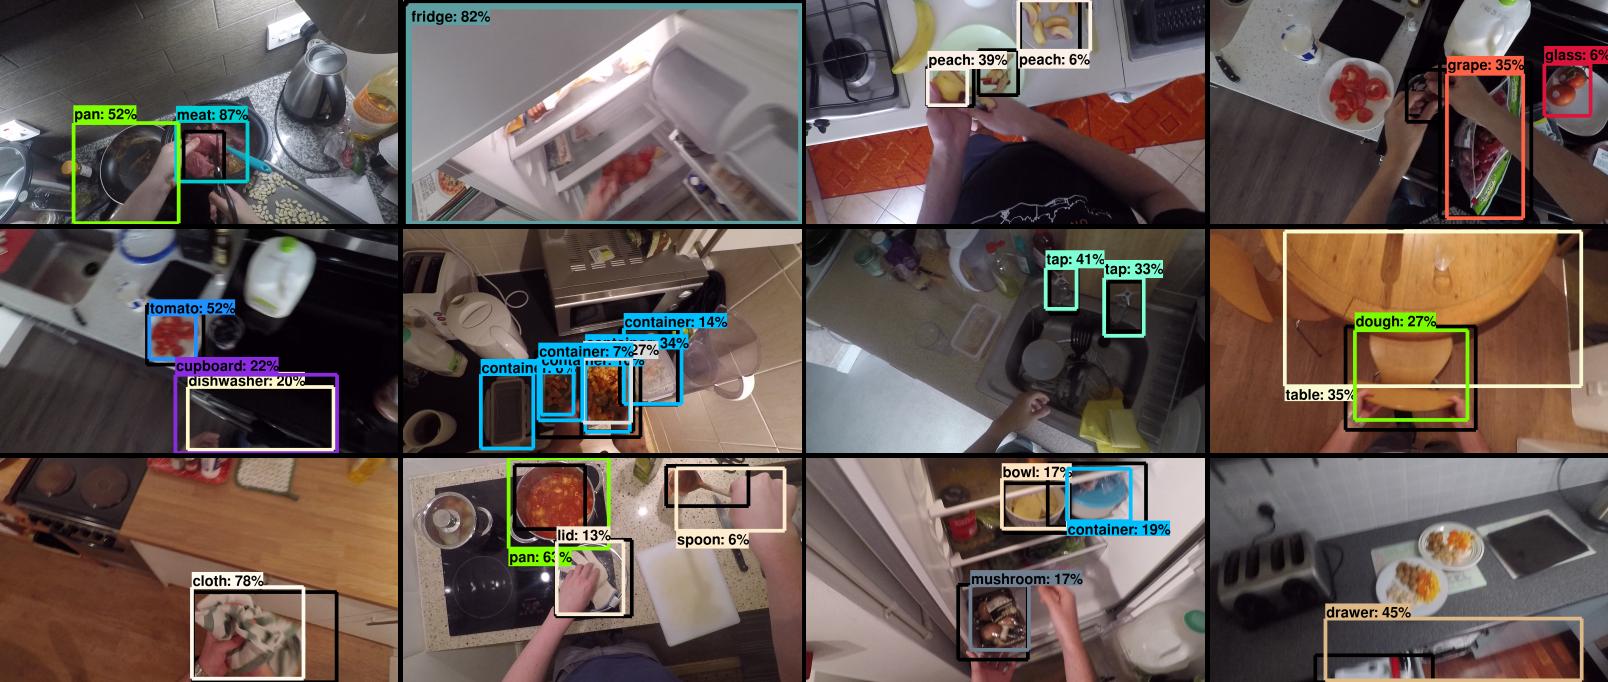 Video Dataset Overview